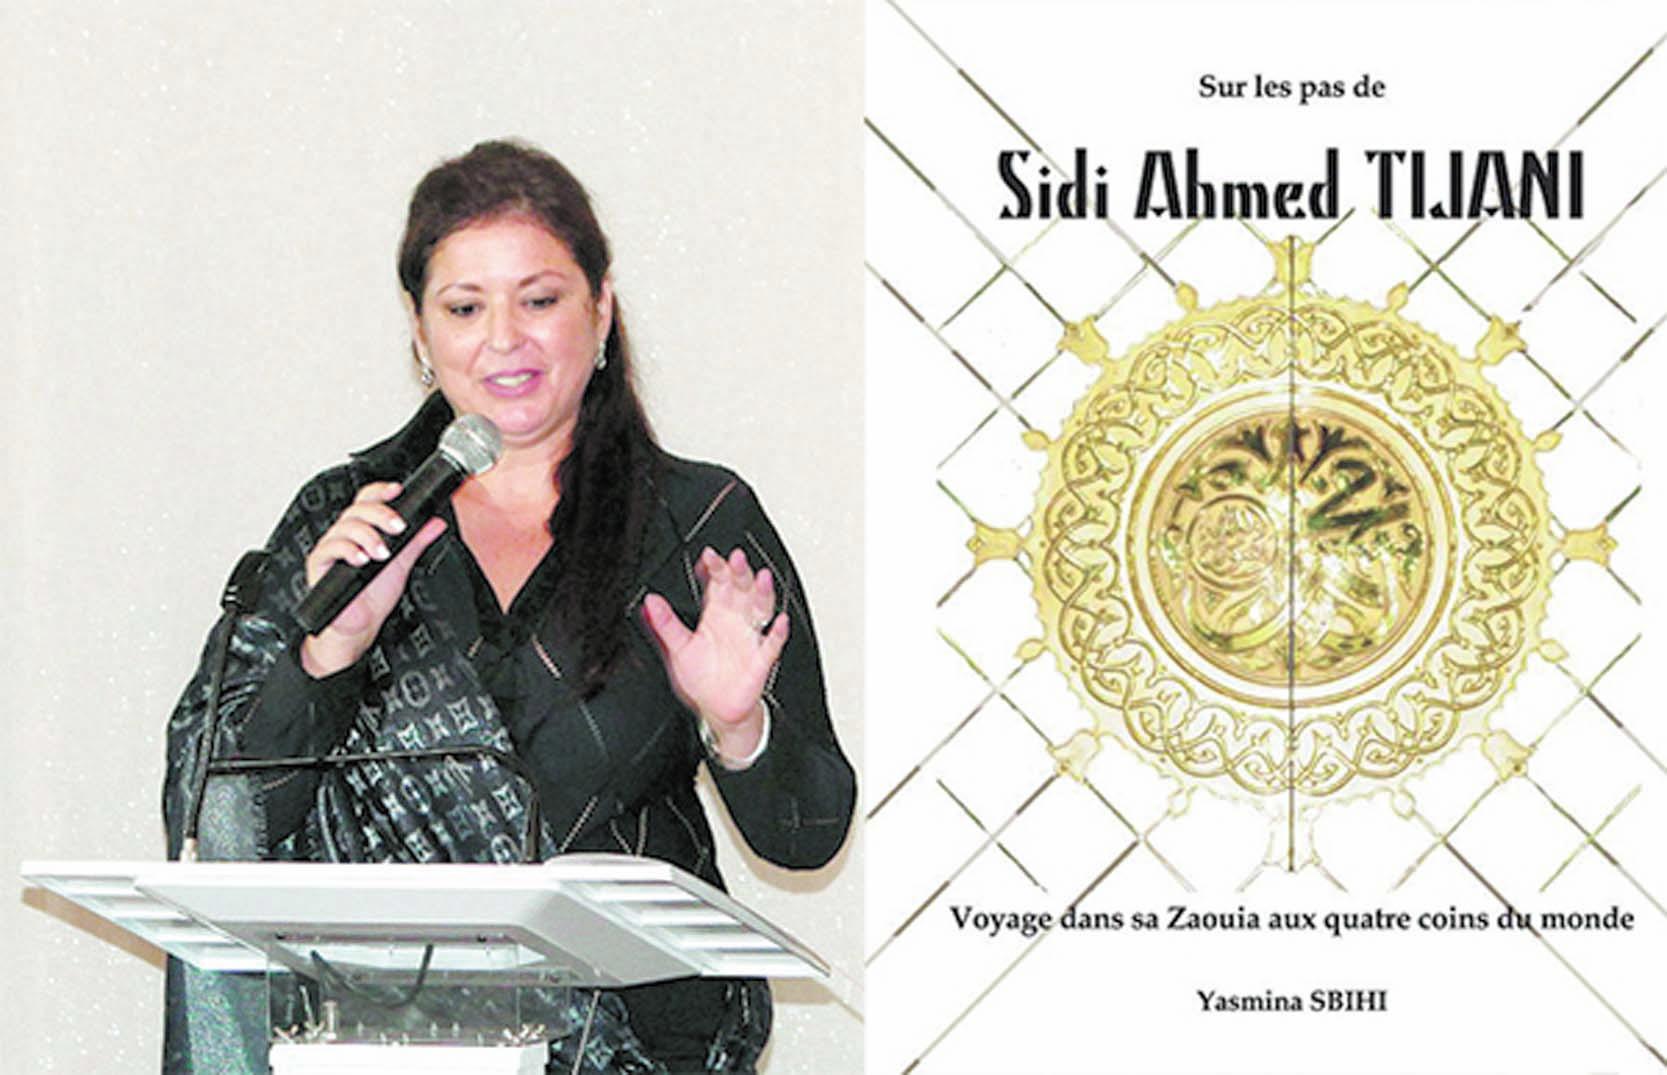 Yasmina Sbihi retrace le parcours de Sidi Ahmed  Tijani, symbole de paix, d'amour et de tolérance